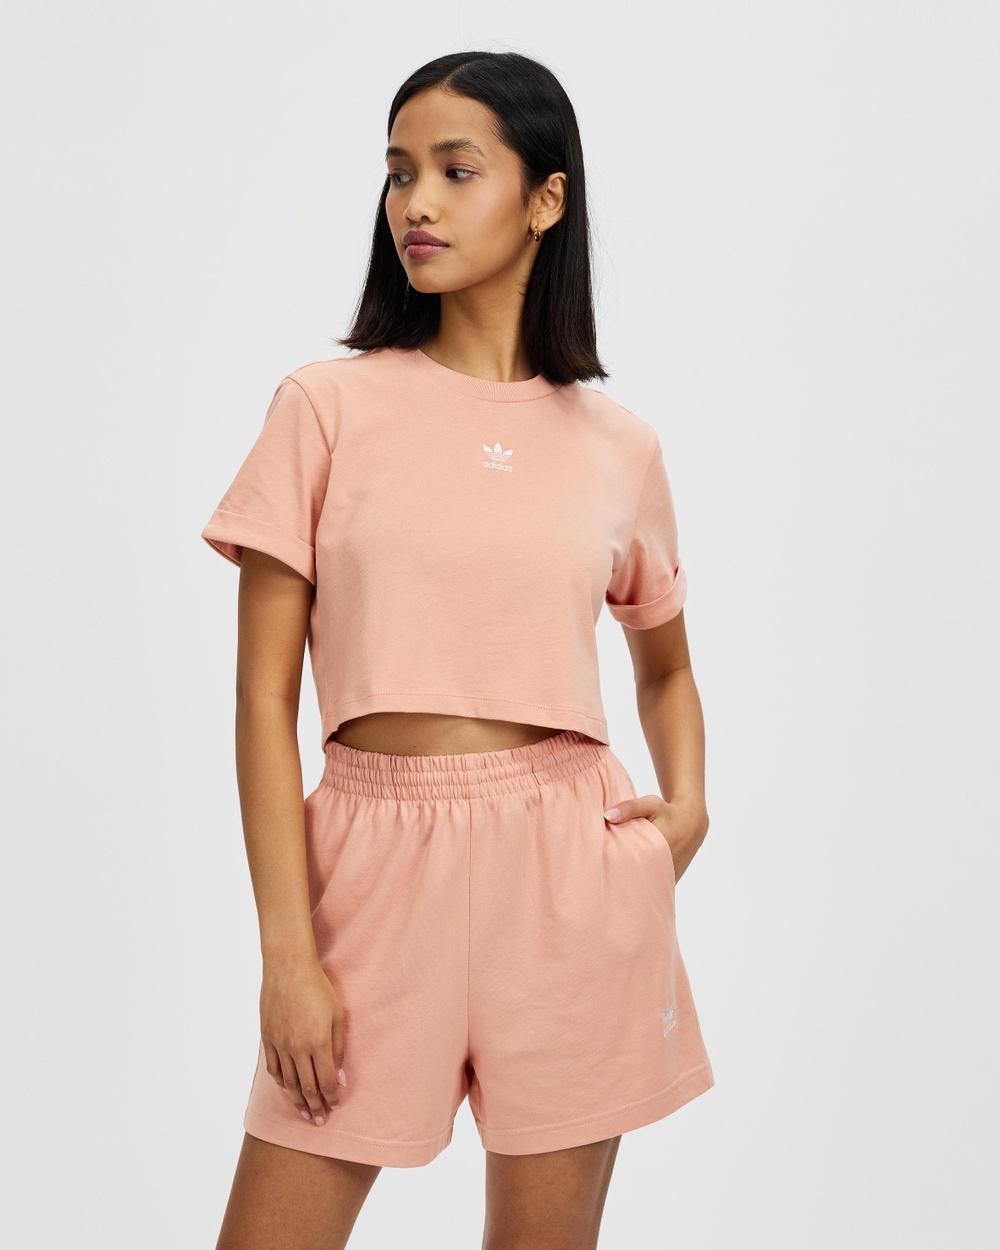 adidas Originals Adicolor Essentials Cropped Tee T-Shirts & Singlets Ambient Blush